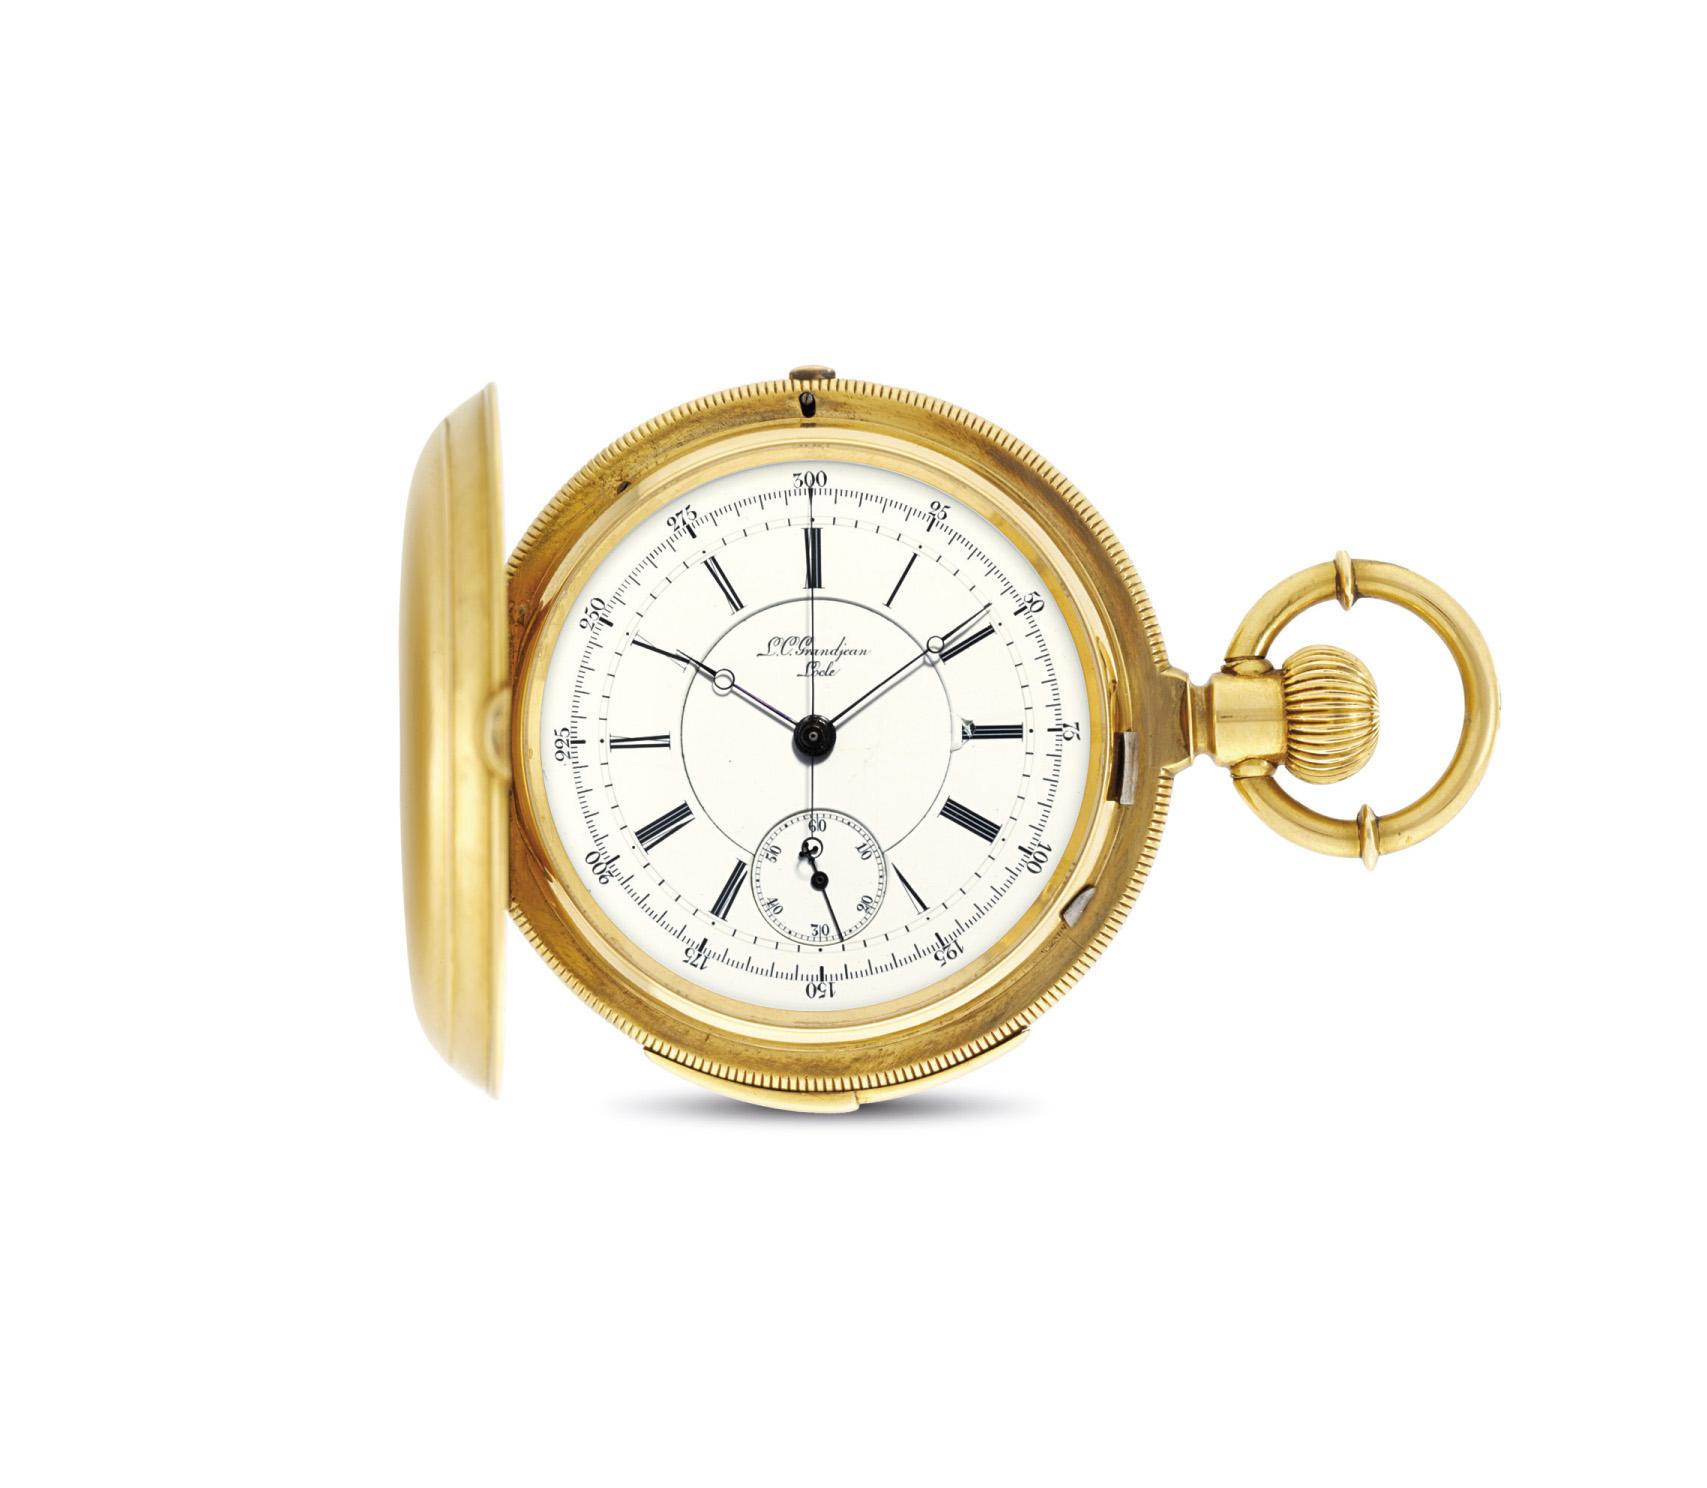 GRANDJEAN. AN 18K GOLD HUNTER CASE MINUTE REPEATING CHRONOGRAPH KEYLESS LEVER WATCH